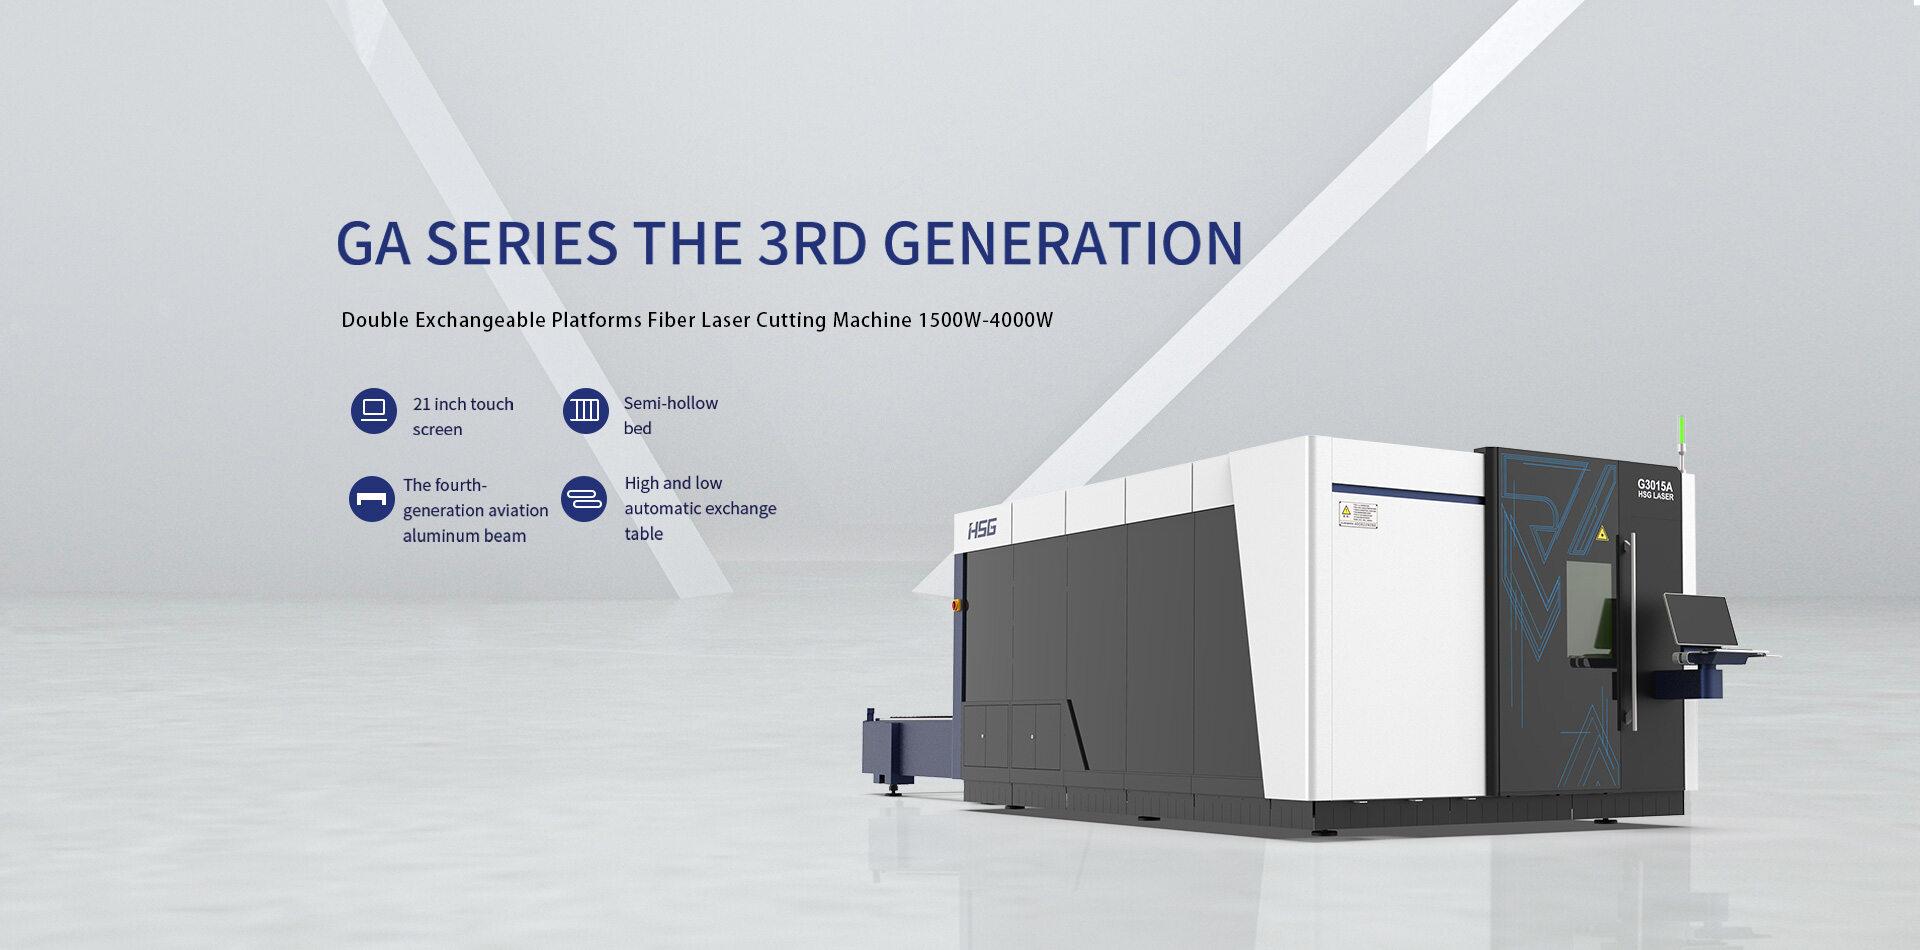 Máy cắt laser fiber HSG dòng GA